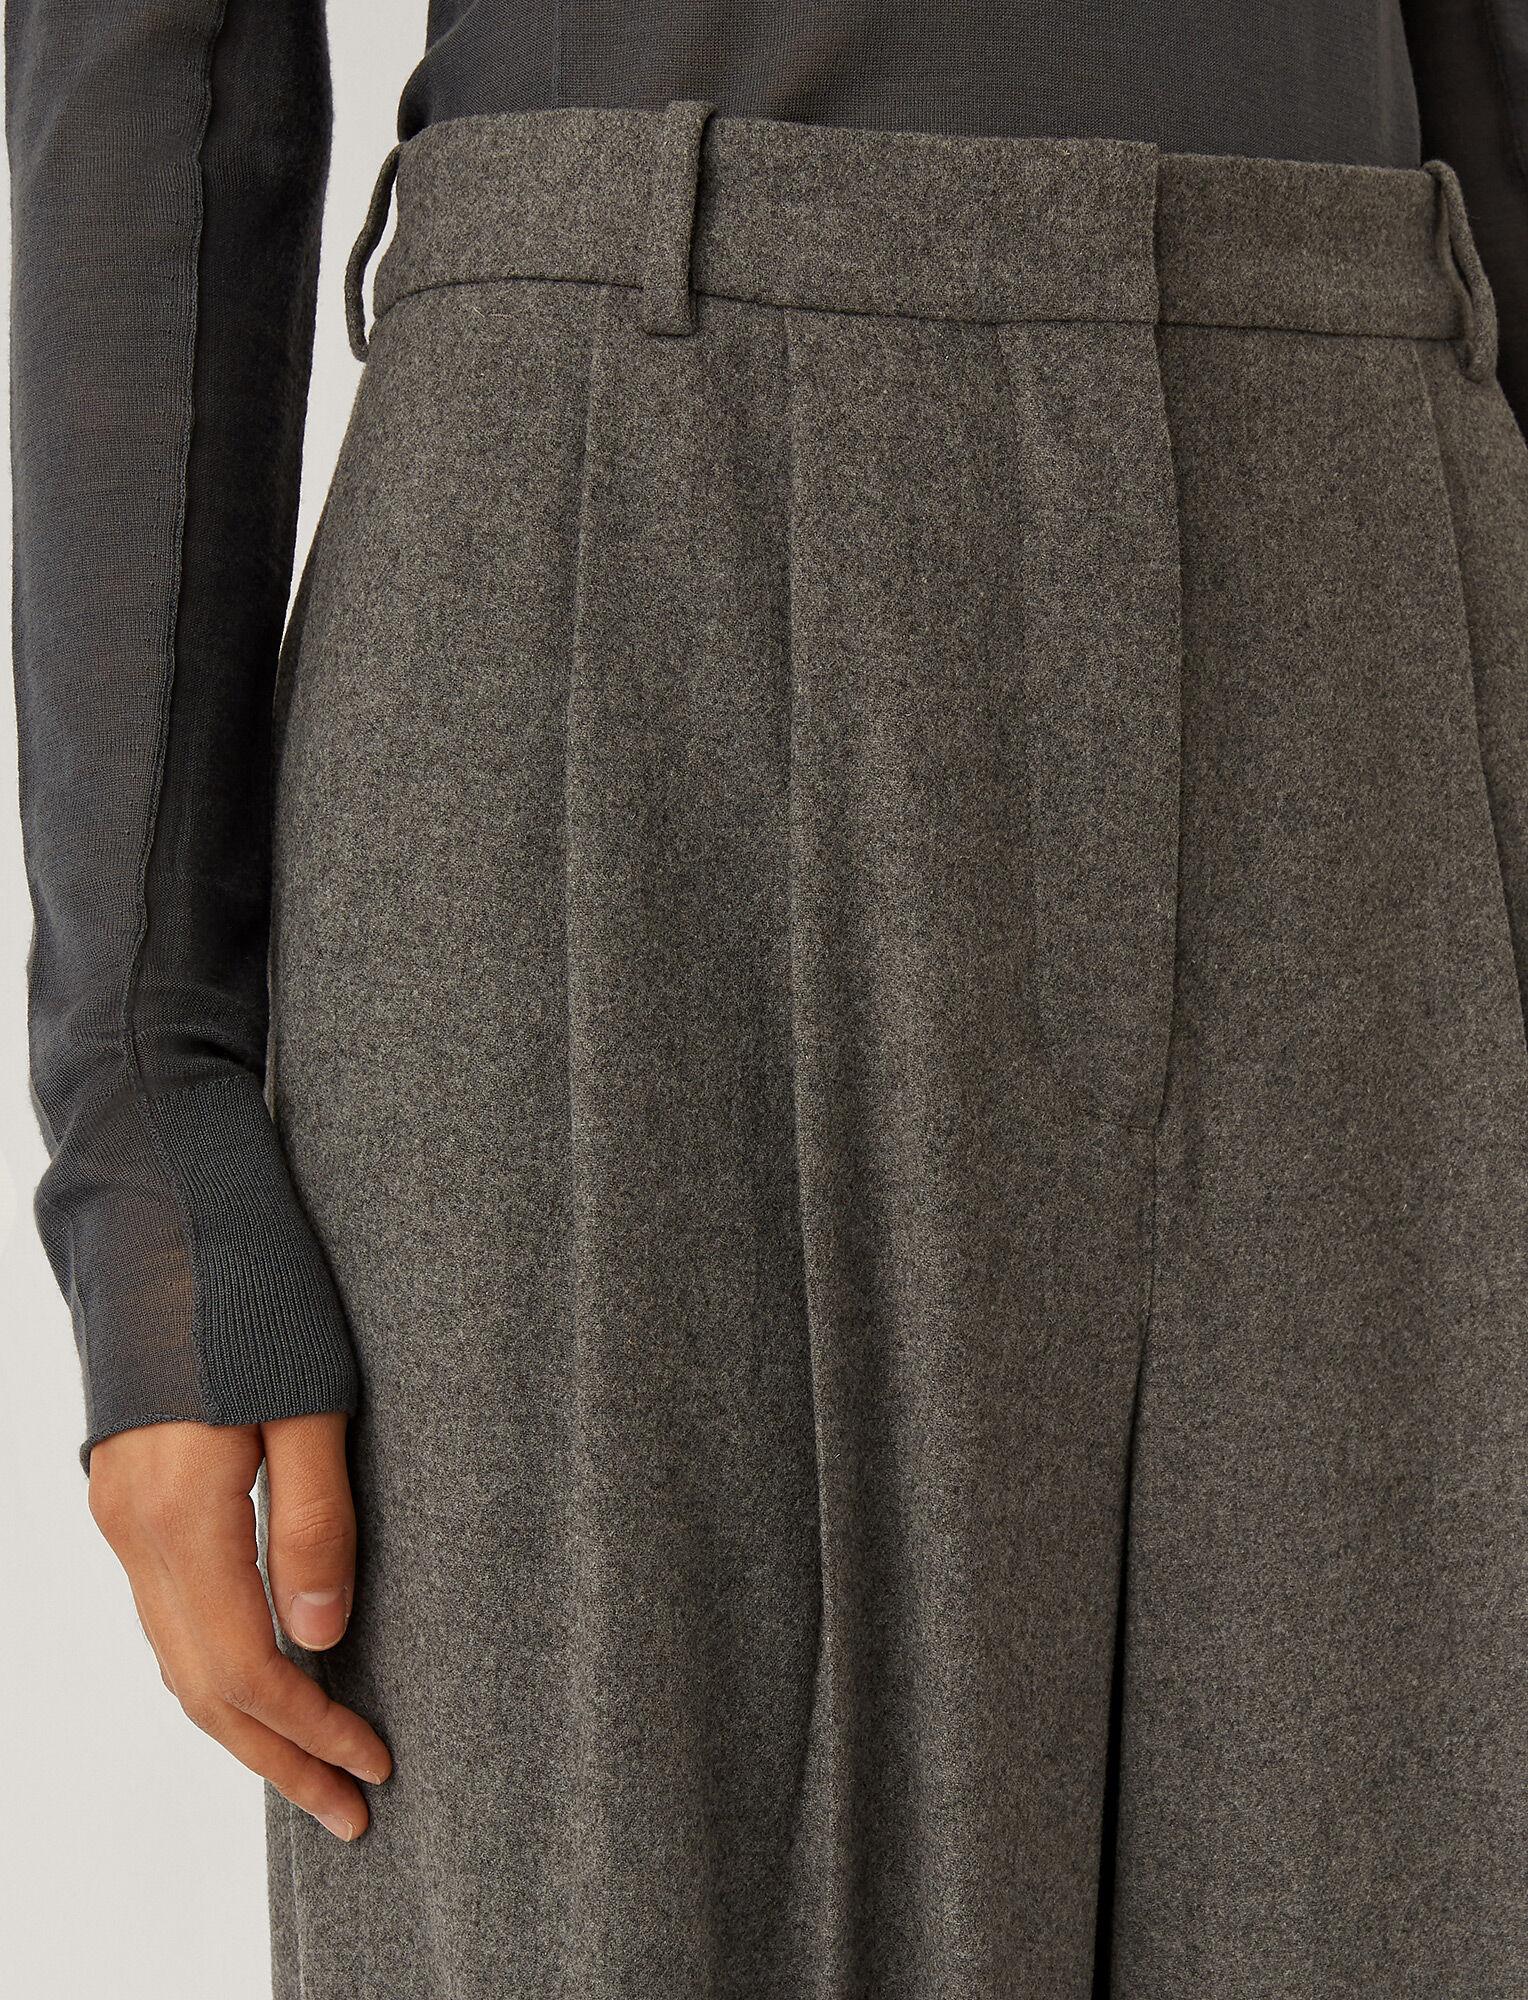 Joseph, Tima Silk Wool Flannel Trousers, in Ash